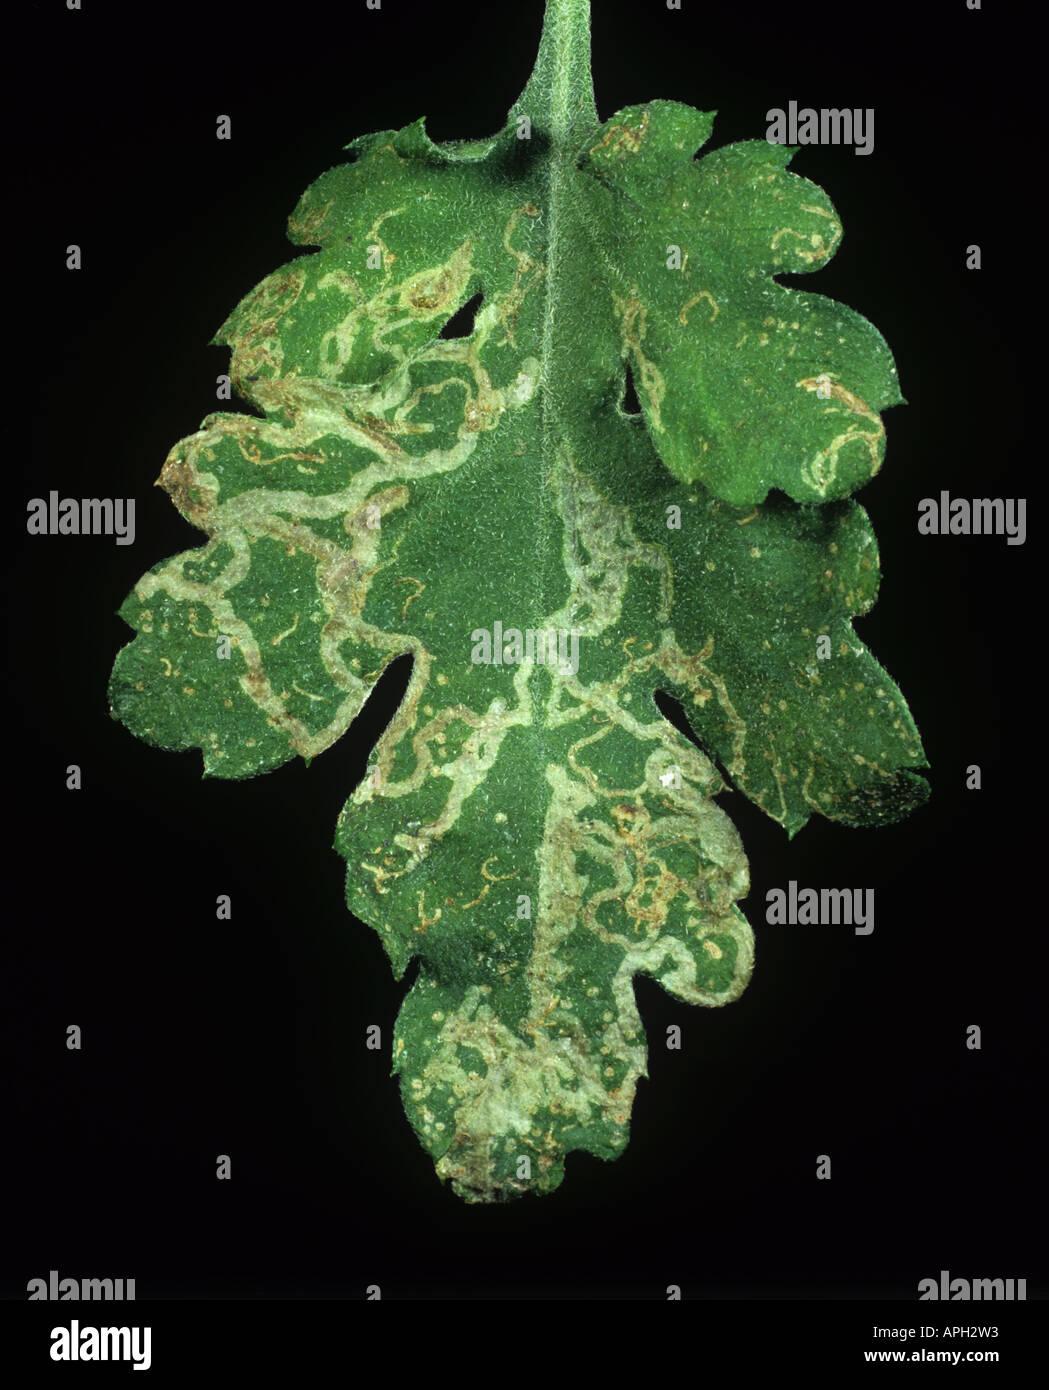 Chrysanthemum leaf miner Chromatomyia syngenesiae mine damage to a chrysanthemum leaf Stock Photo